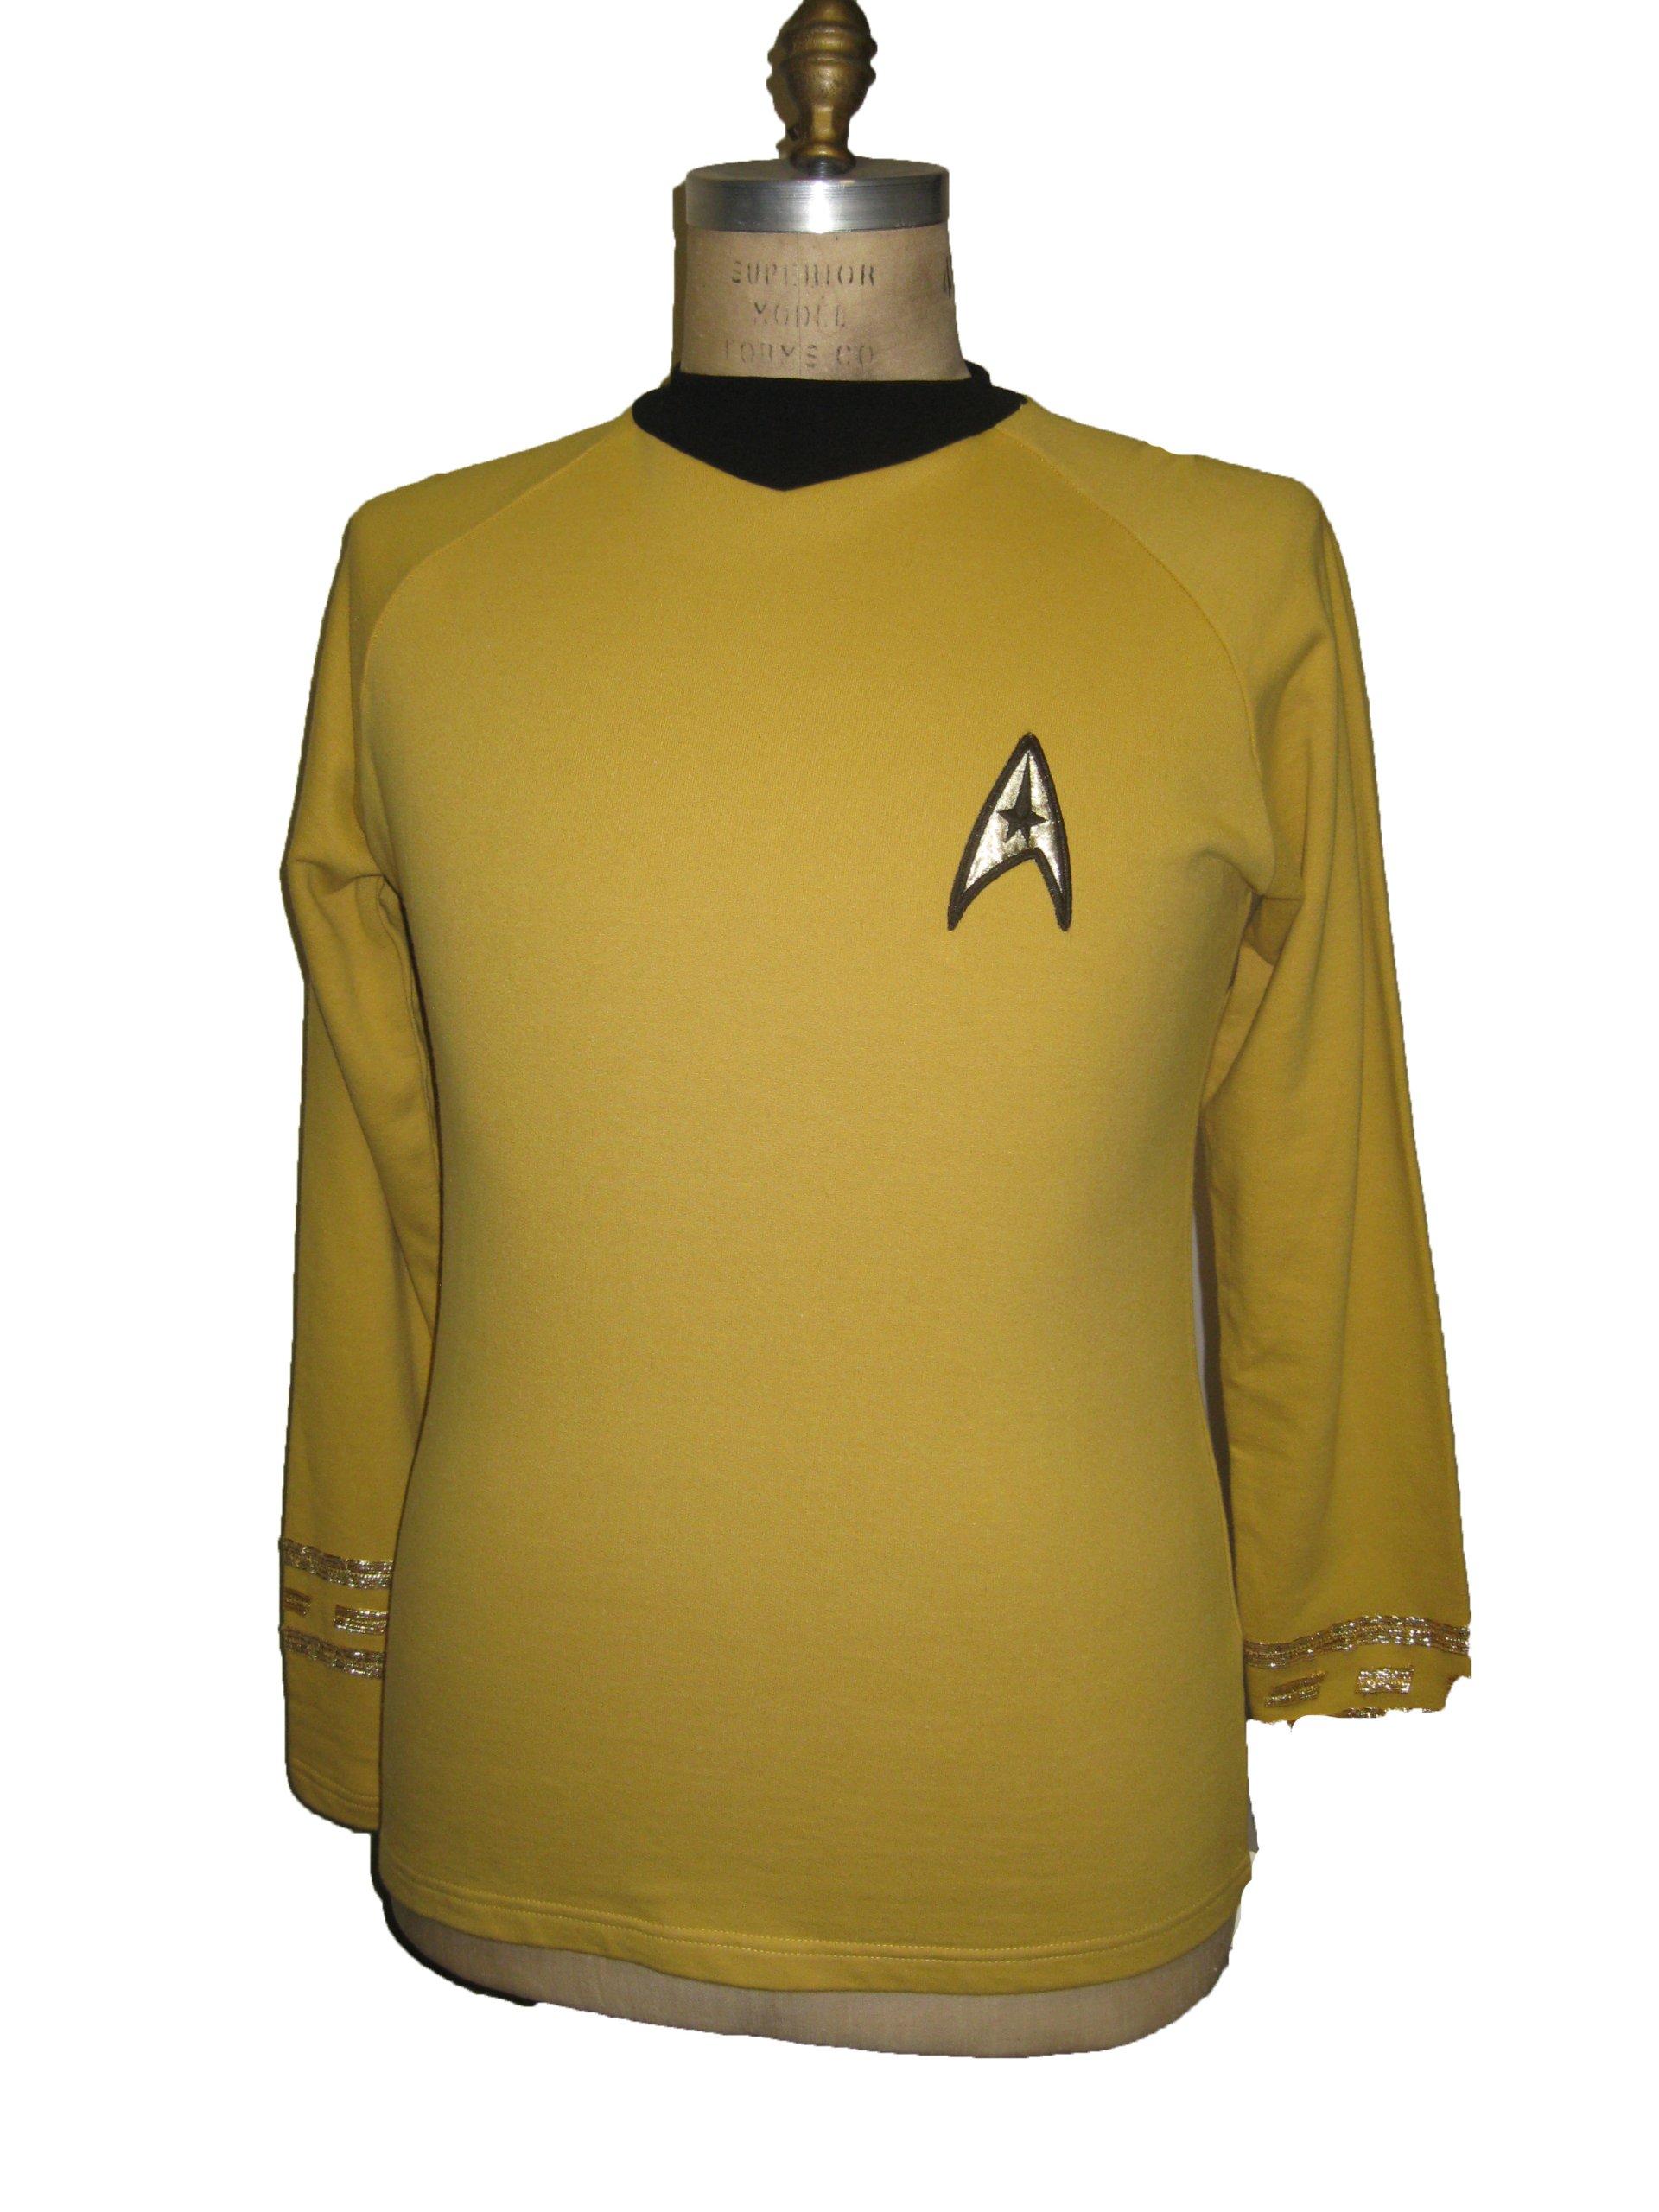 Star Trek Original Series - Uniform Shirt - Captain - Super Deluxe - Small By Filmwelt Berlin